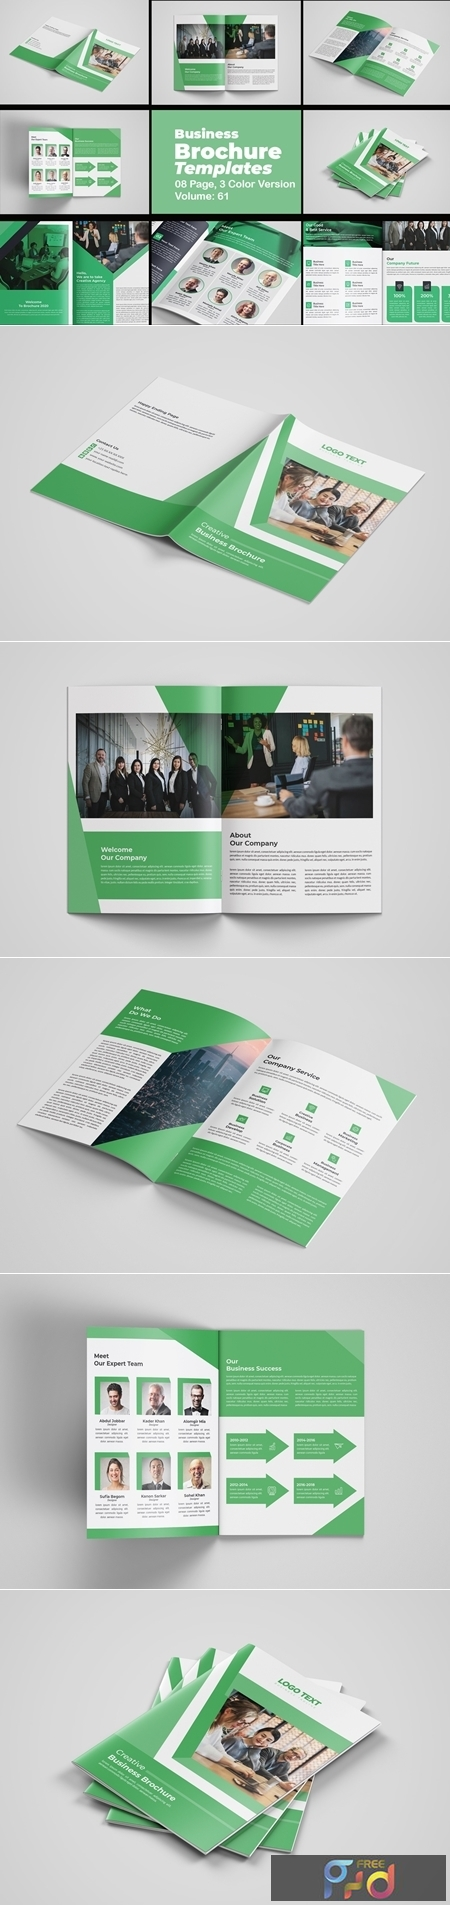 Brochure Template 4520271 1